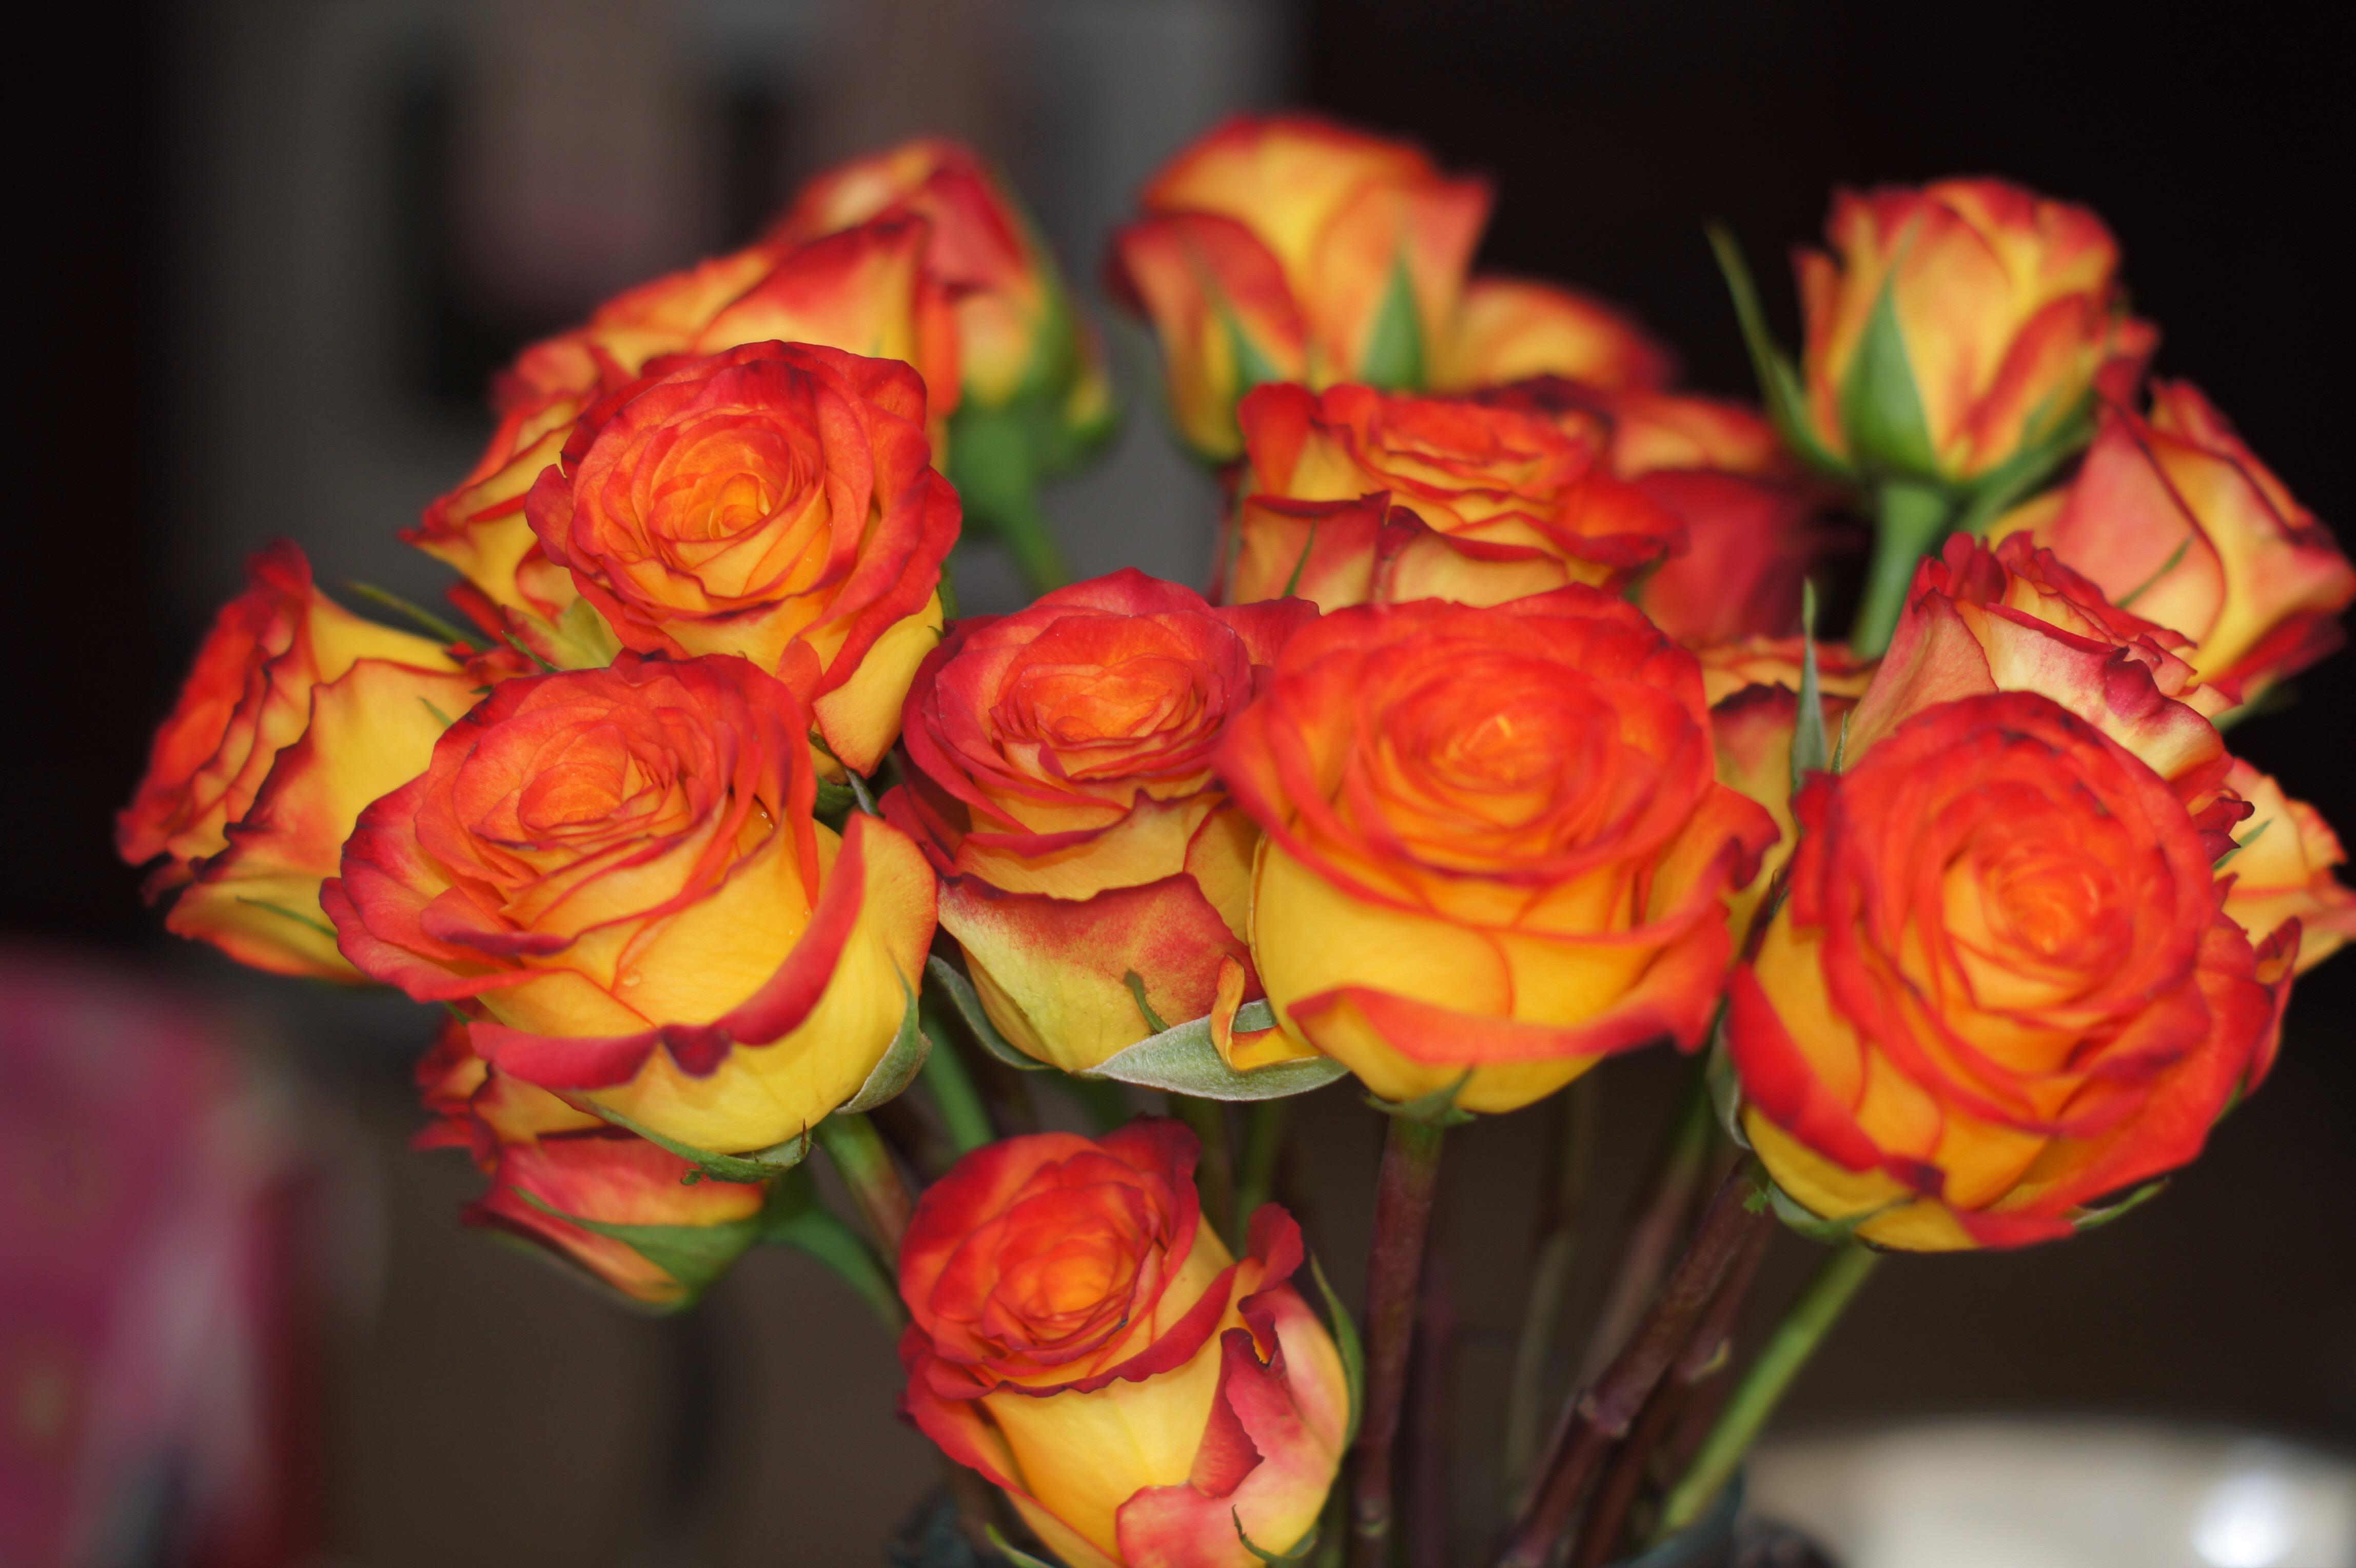 50 roses $50, 365 days. Just Fresh Roses.